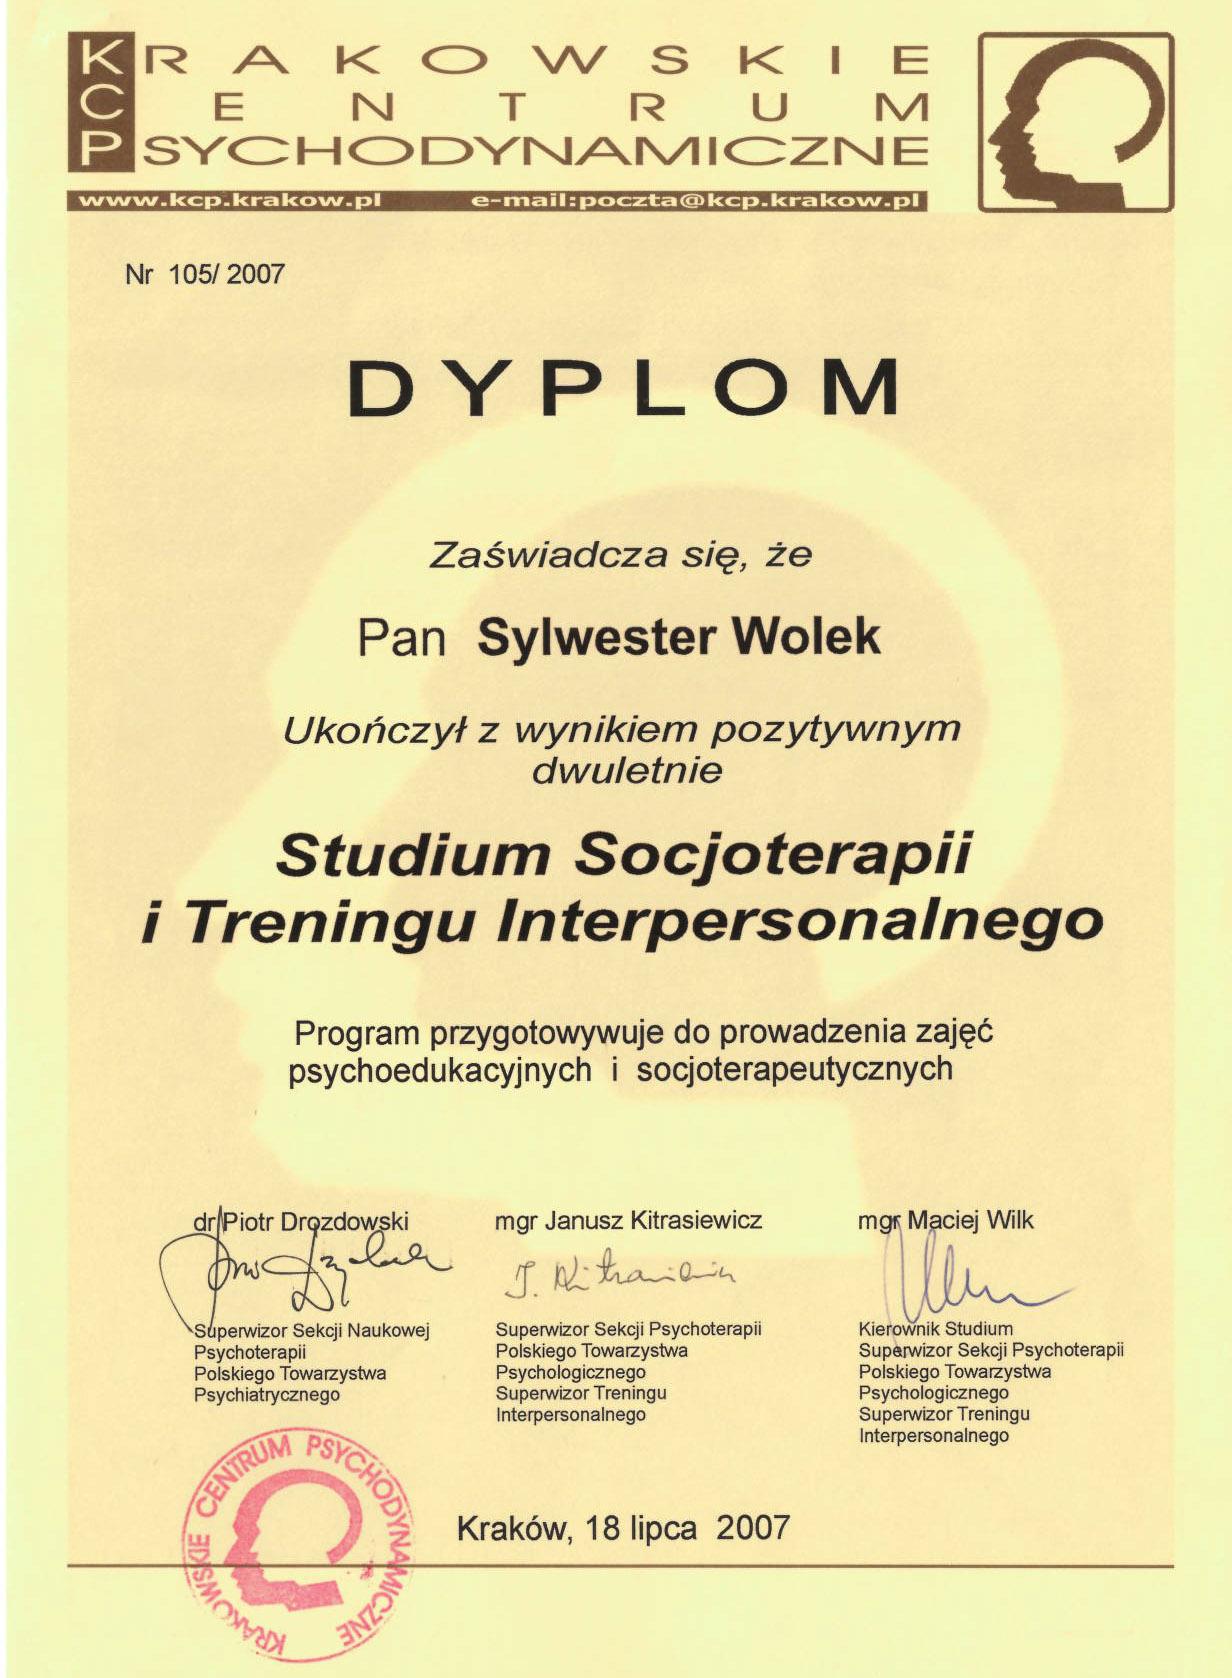 Studium Socjoterapii i Treningu Interpersonalnego